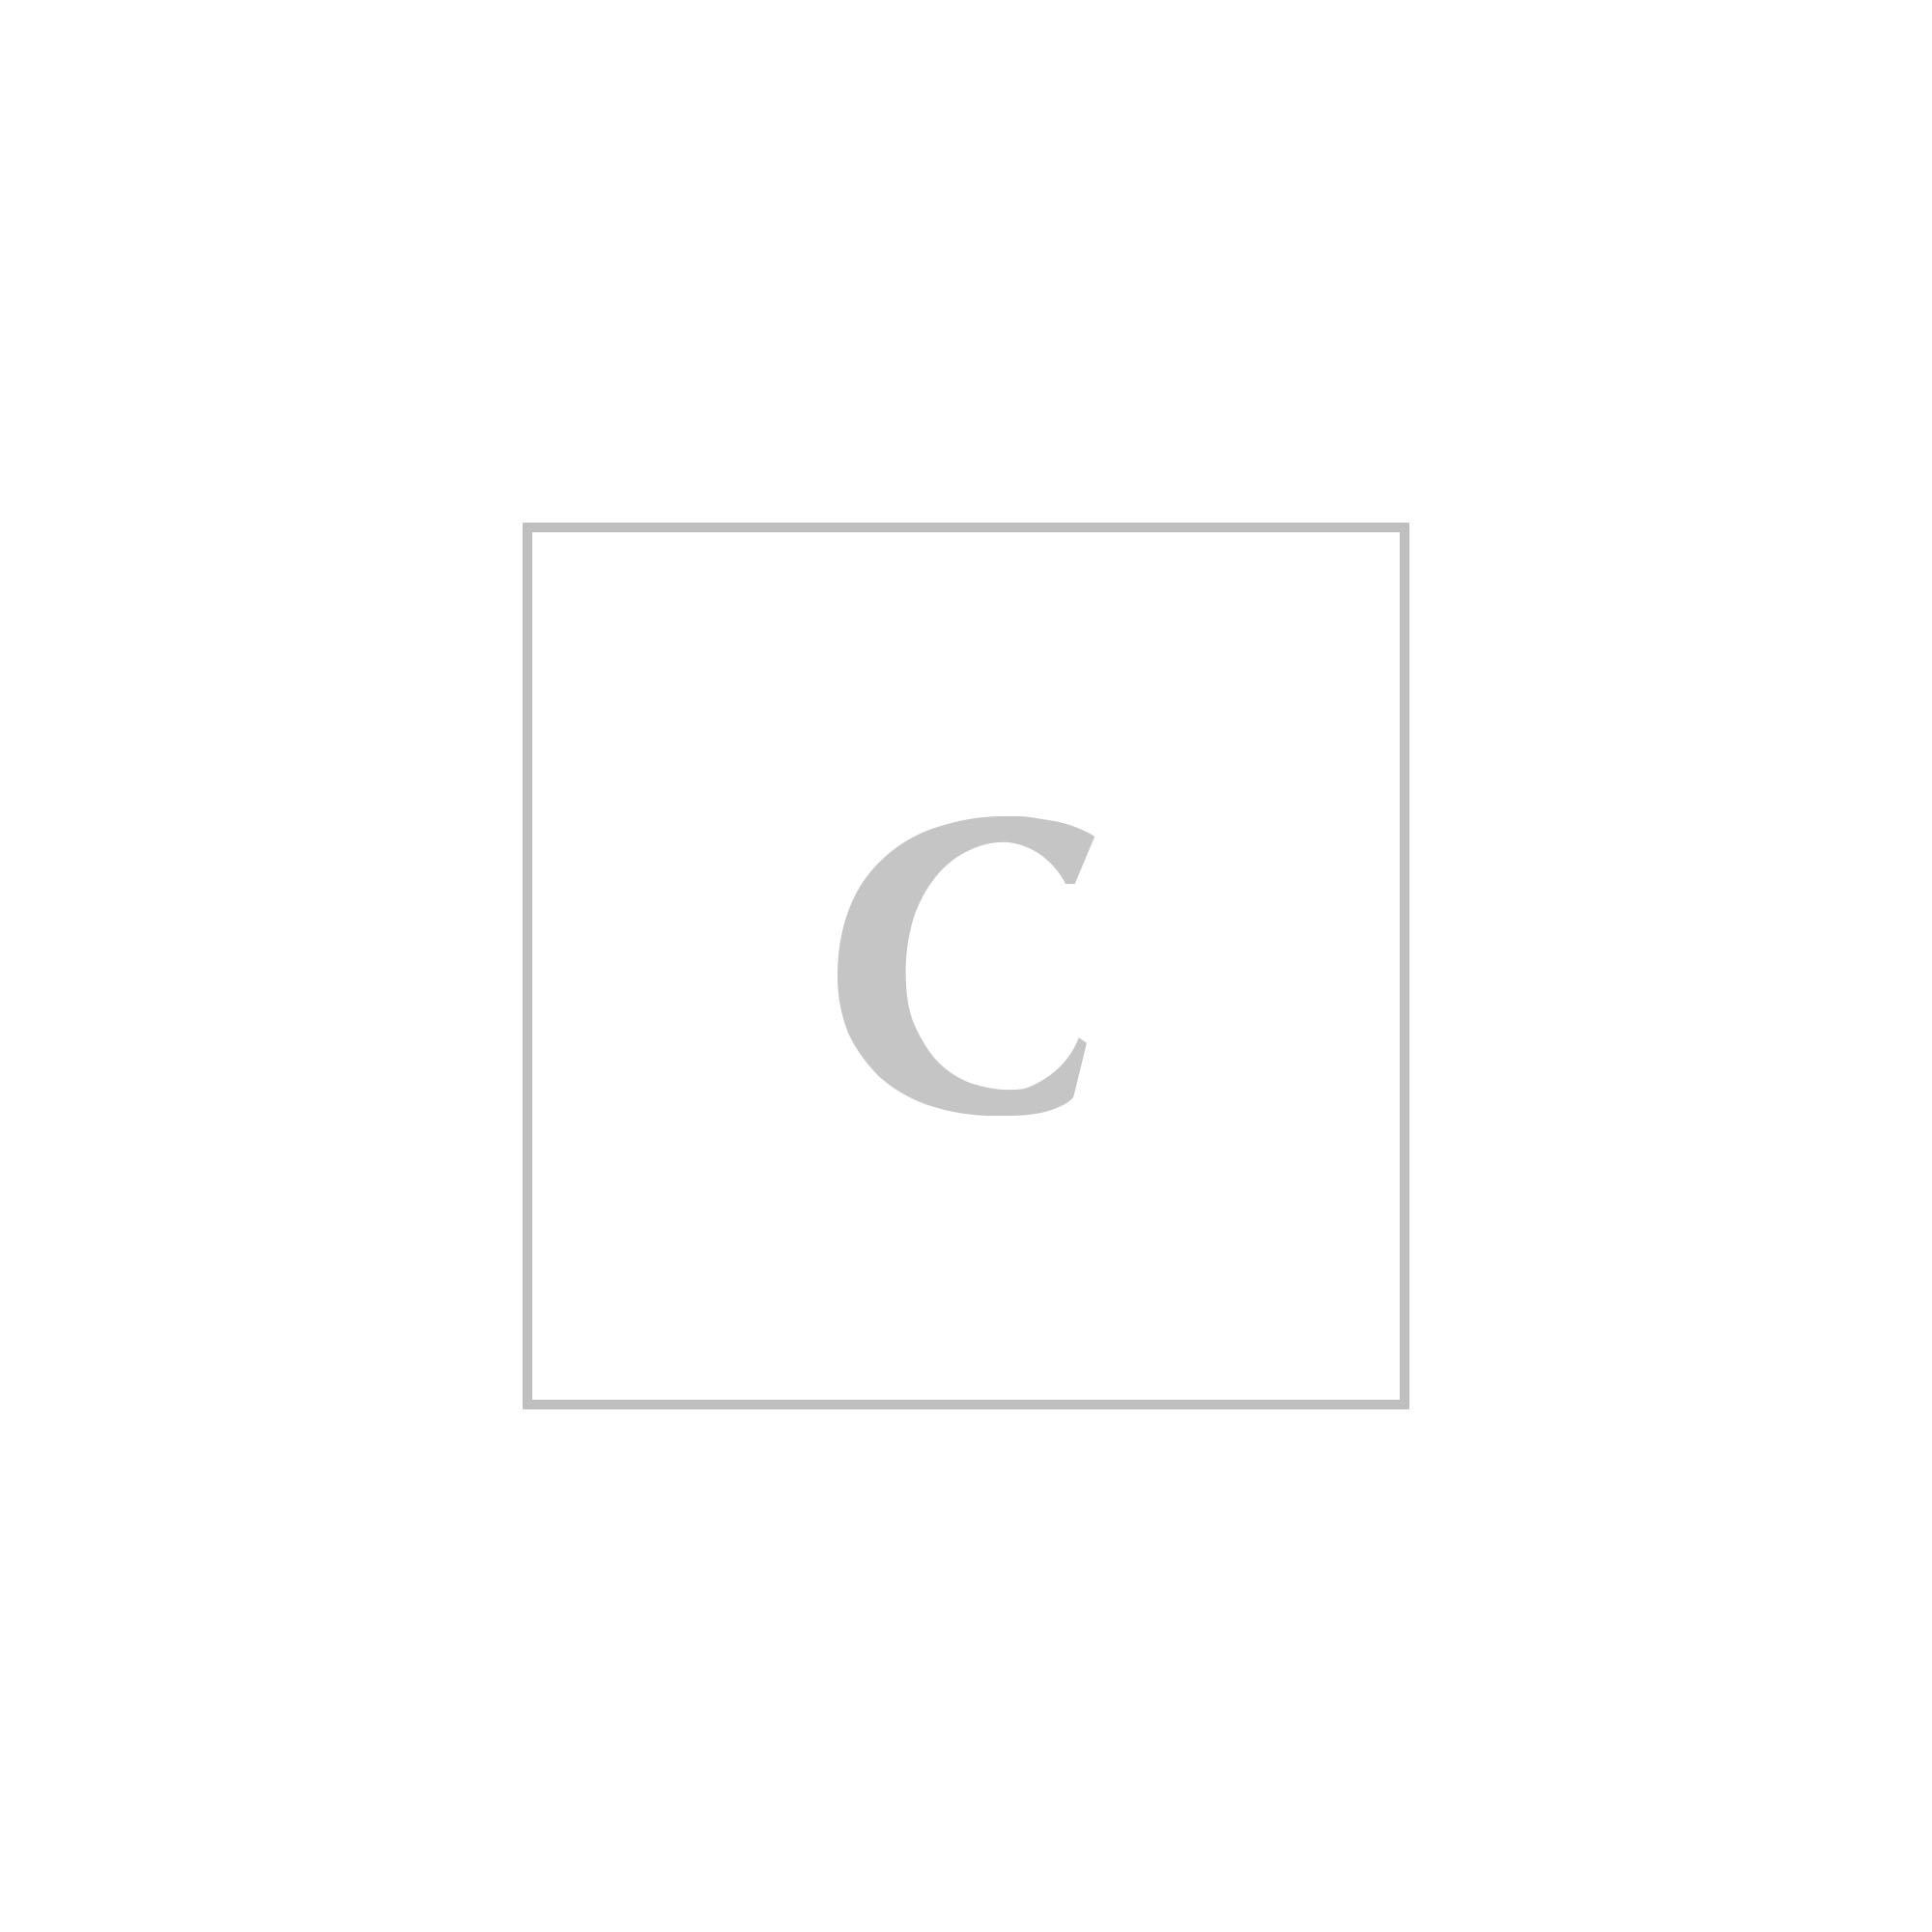 Dolce & gabbana p.foglio vitello palmellato